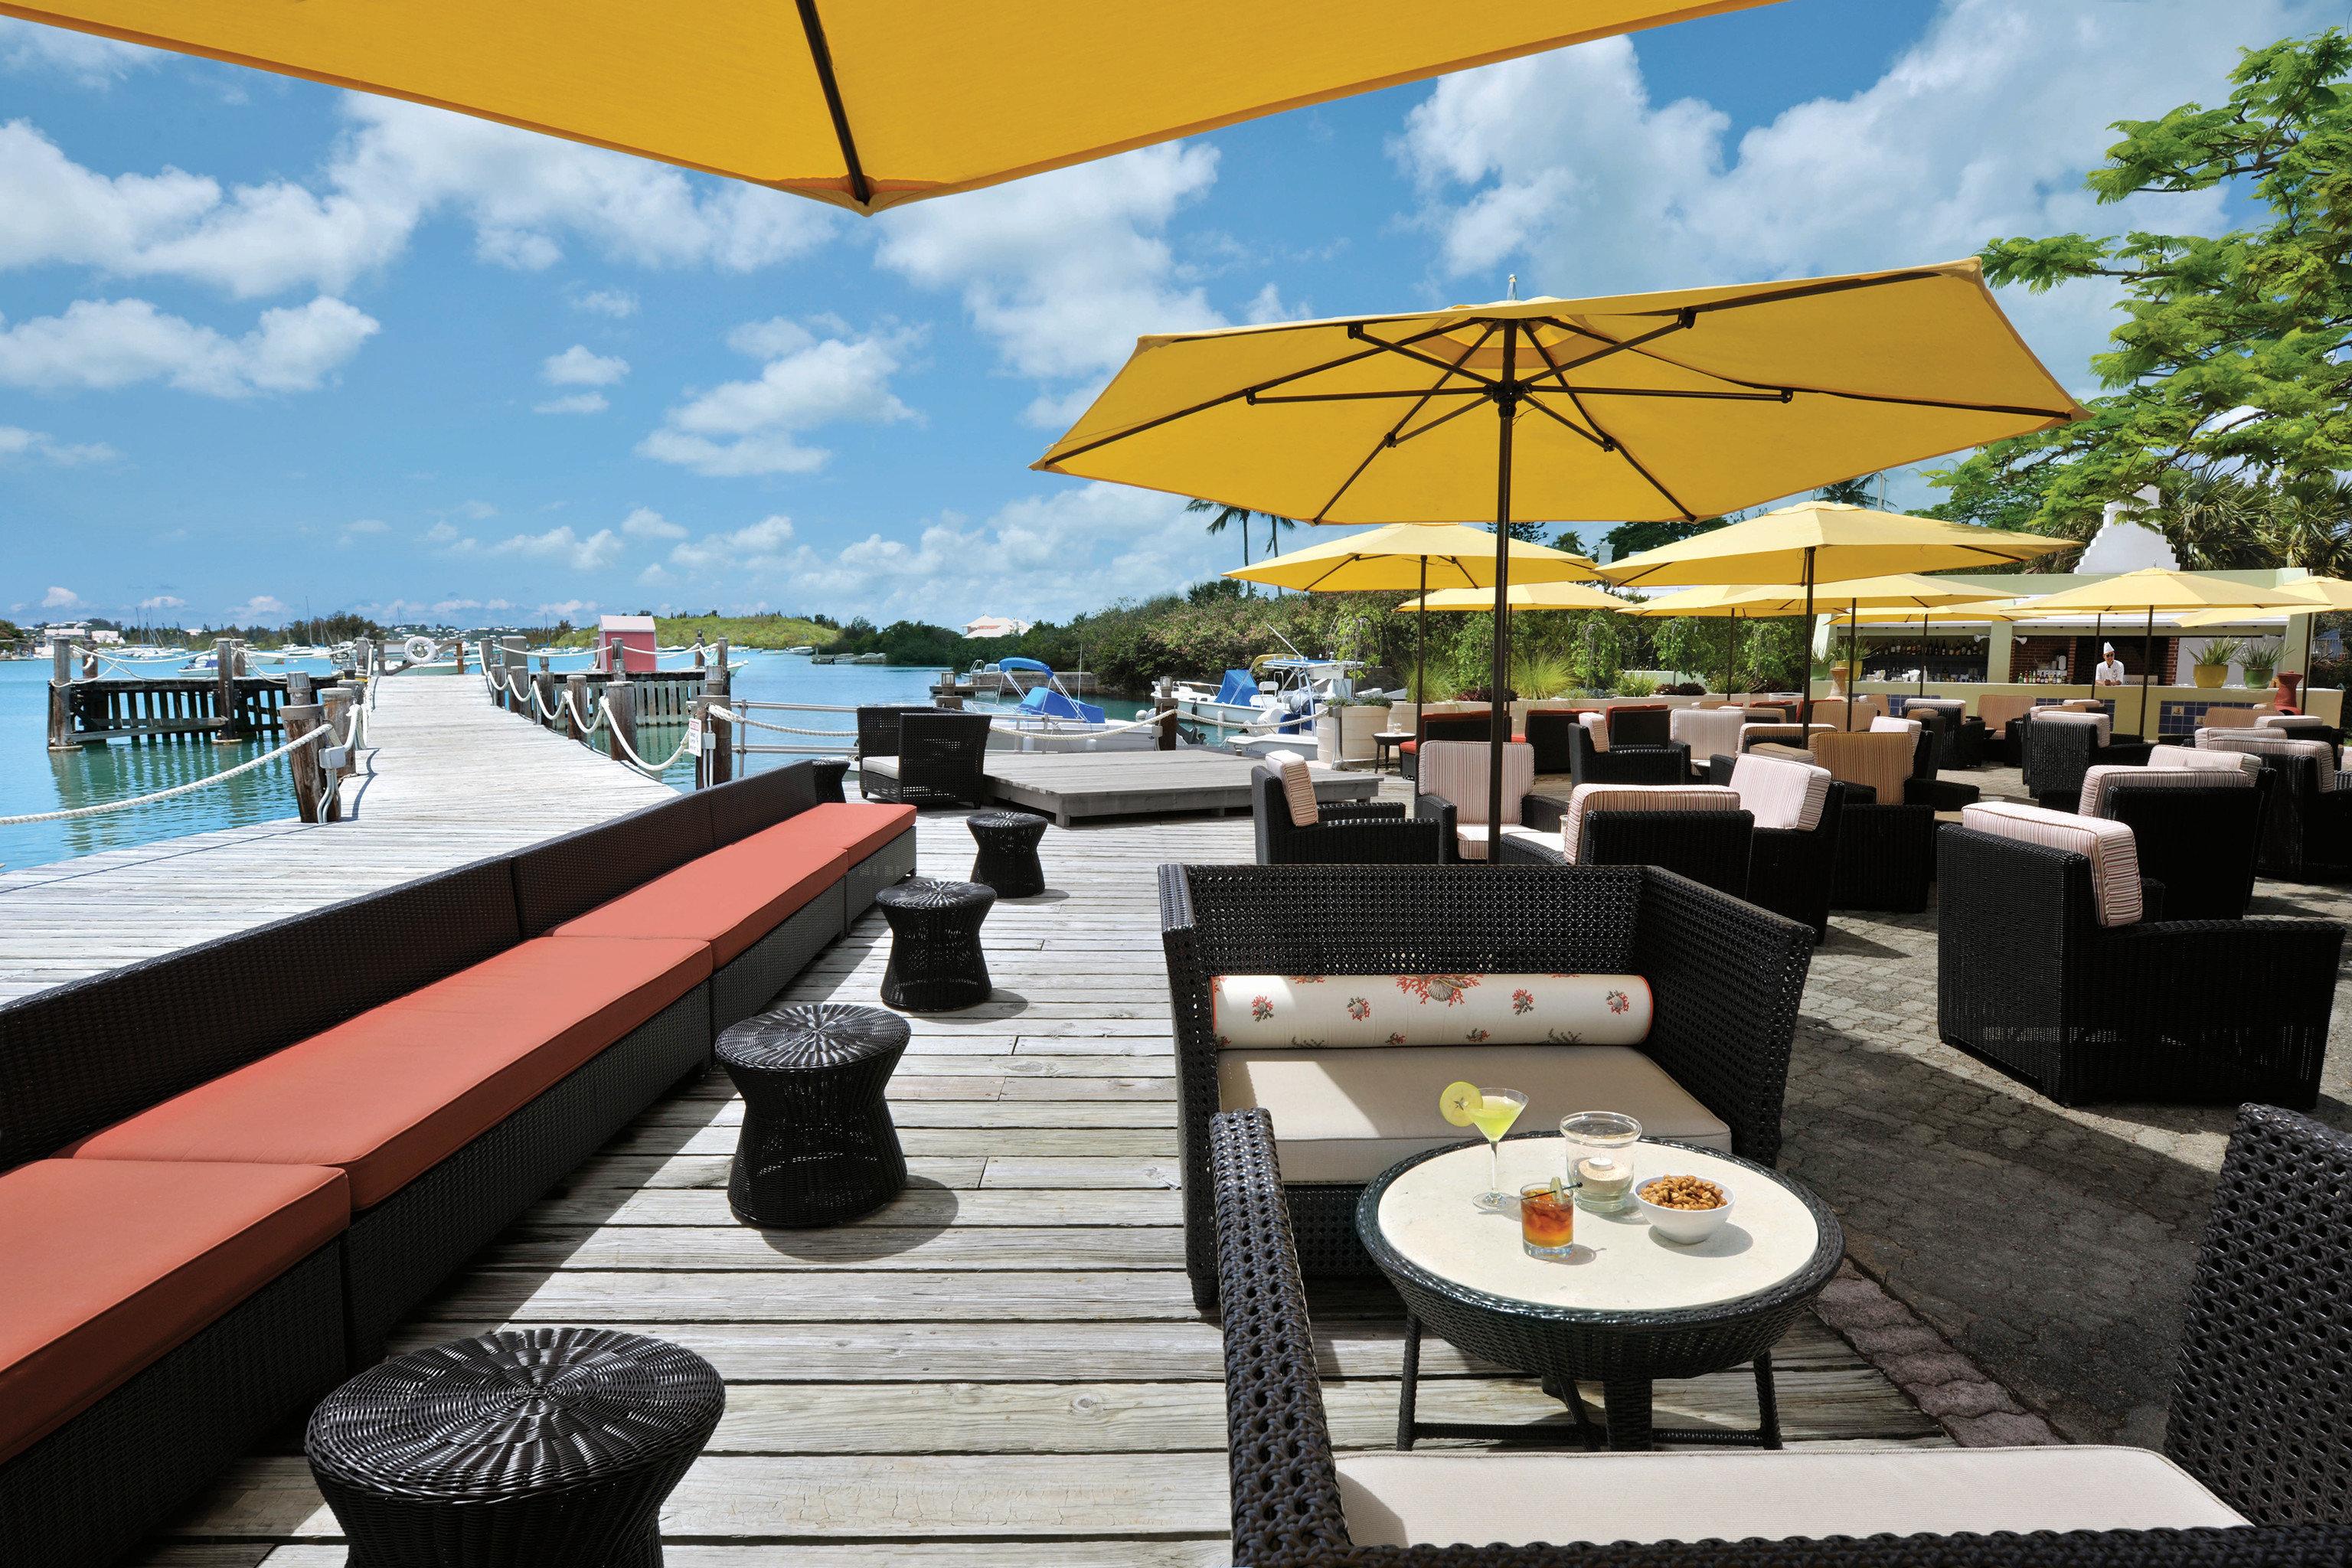 Bar Beachfront Dining Drink Eat Hotels Scenic views sky leisure umbrella accessory restaurant Resort vehicle yacht